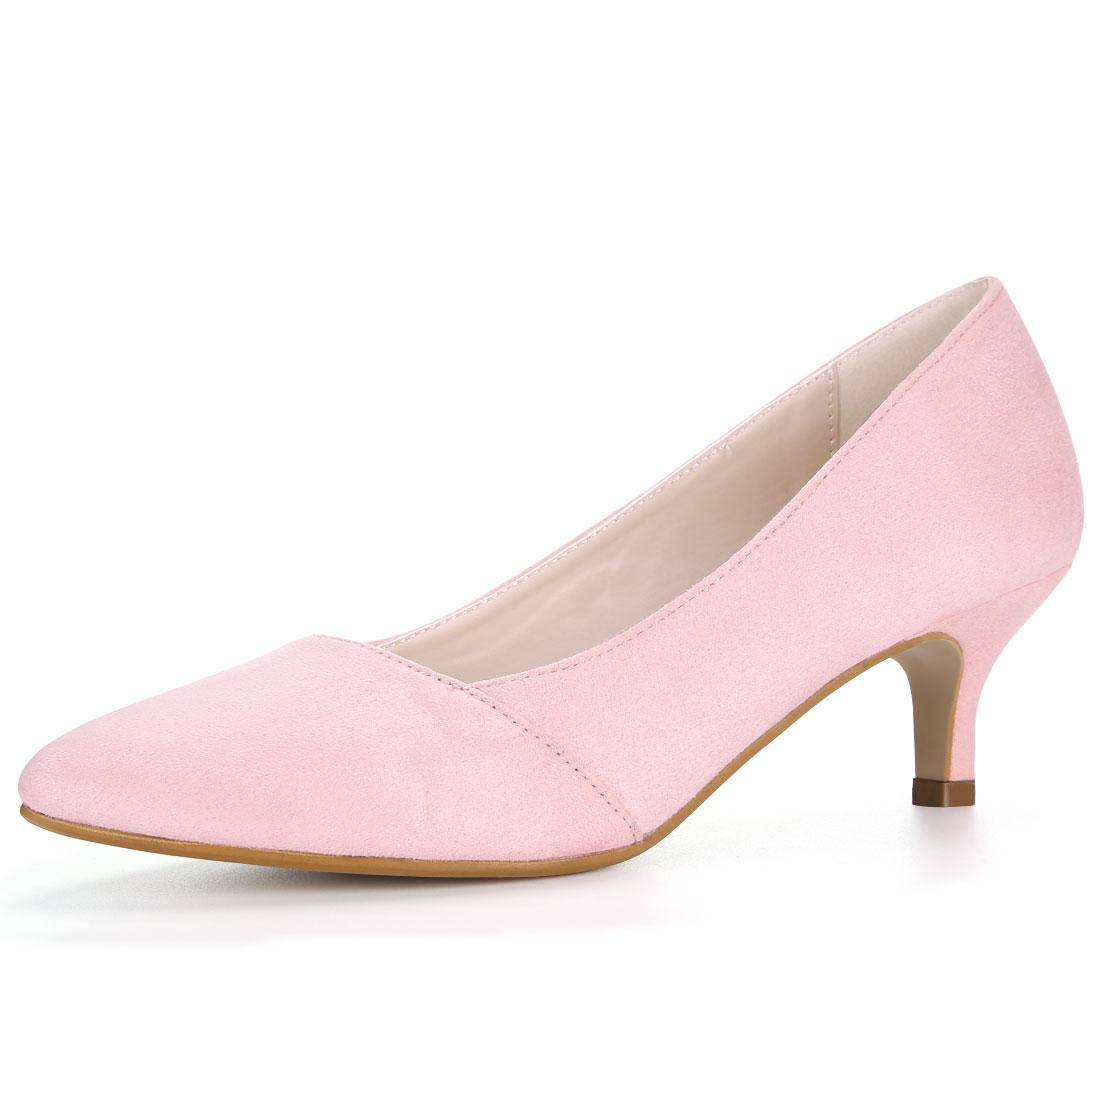 Women Pointed Toe Mid Stiletto Heel Pumps Pink US 5.5